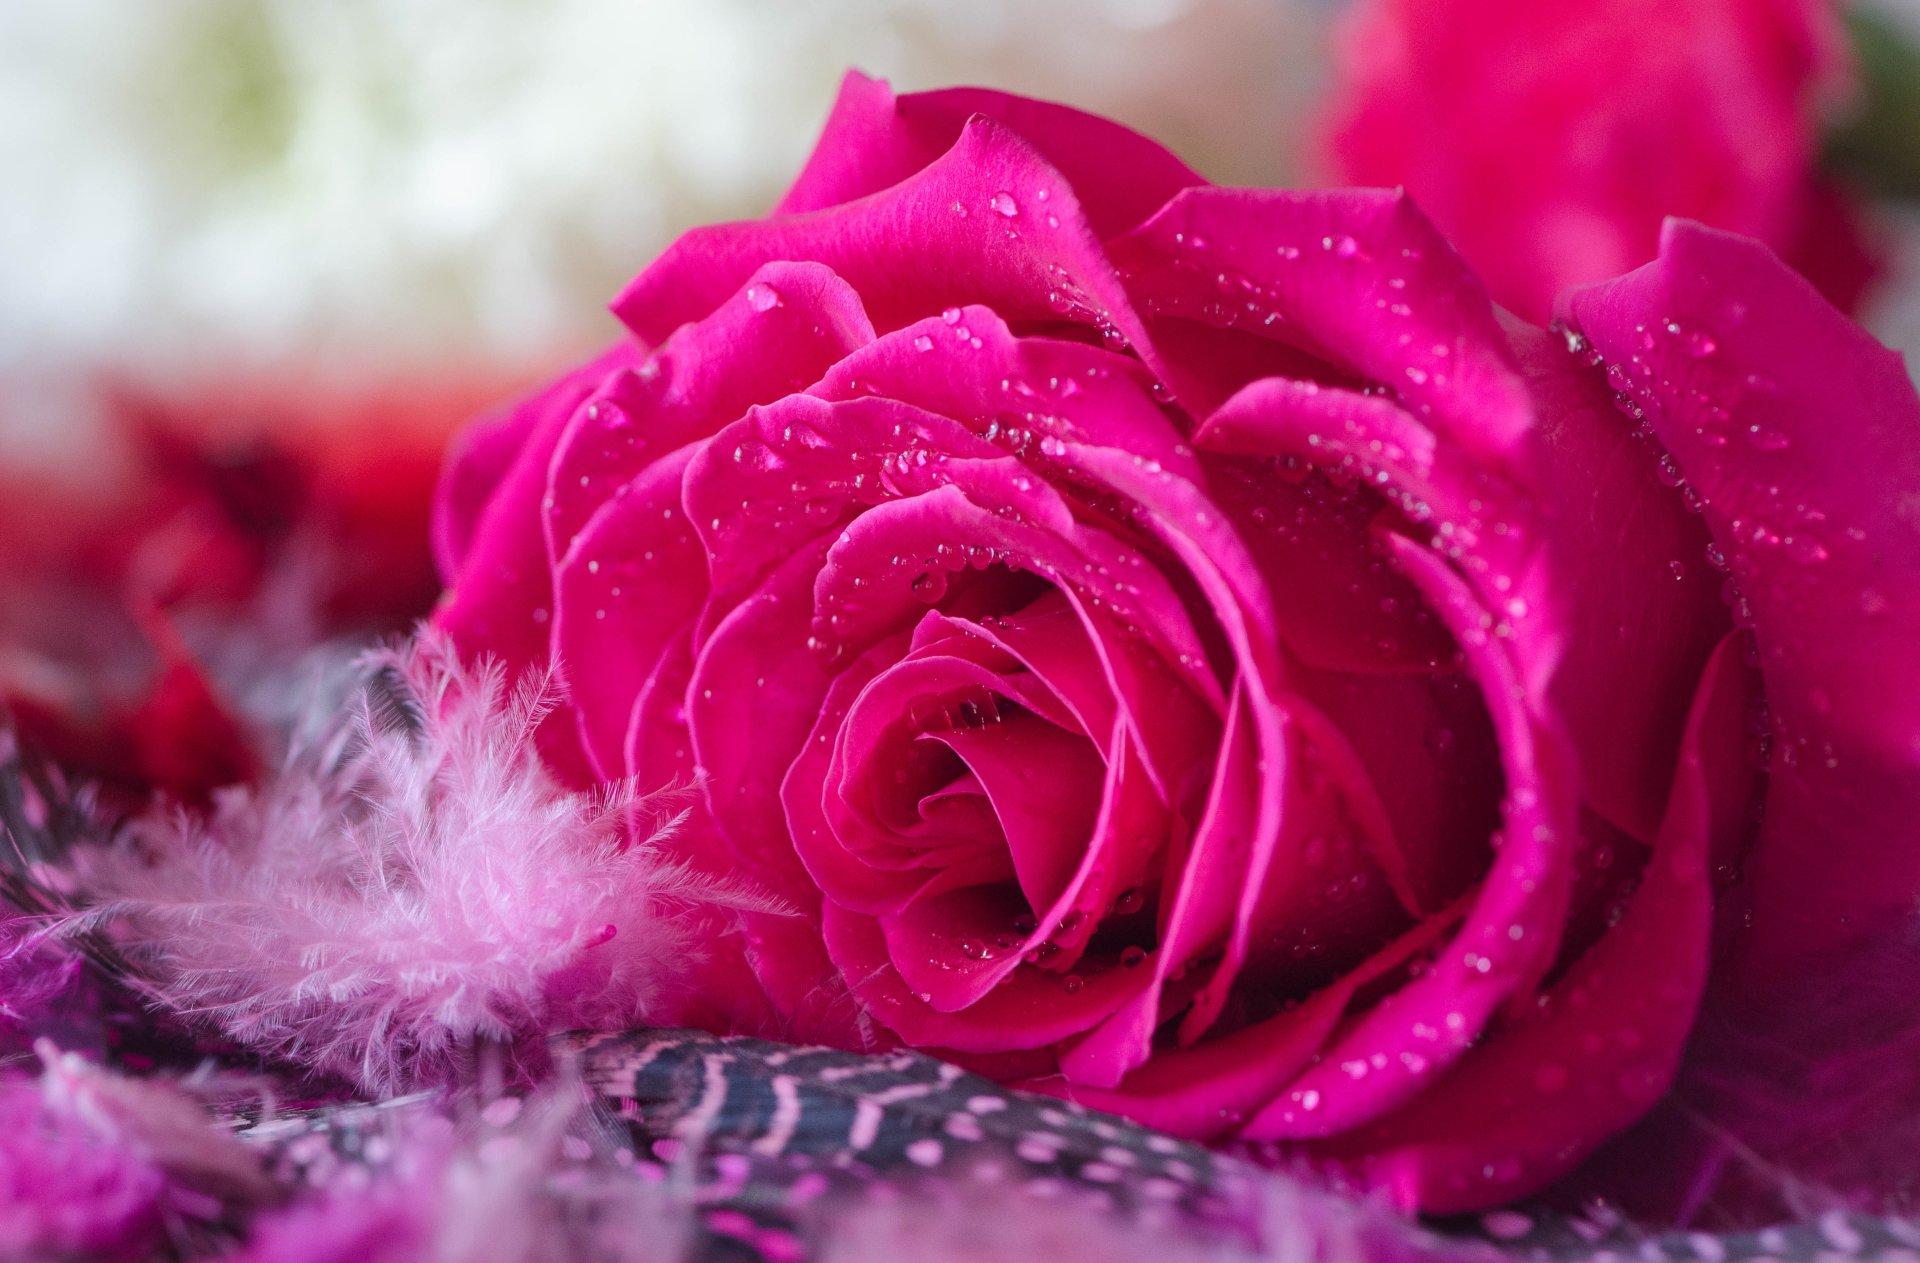 Hot pink rose 4k ultra hd wallpaper background image - Pink wallpaper 4k ...